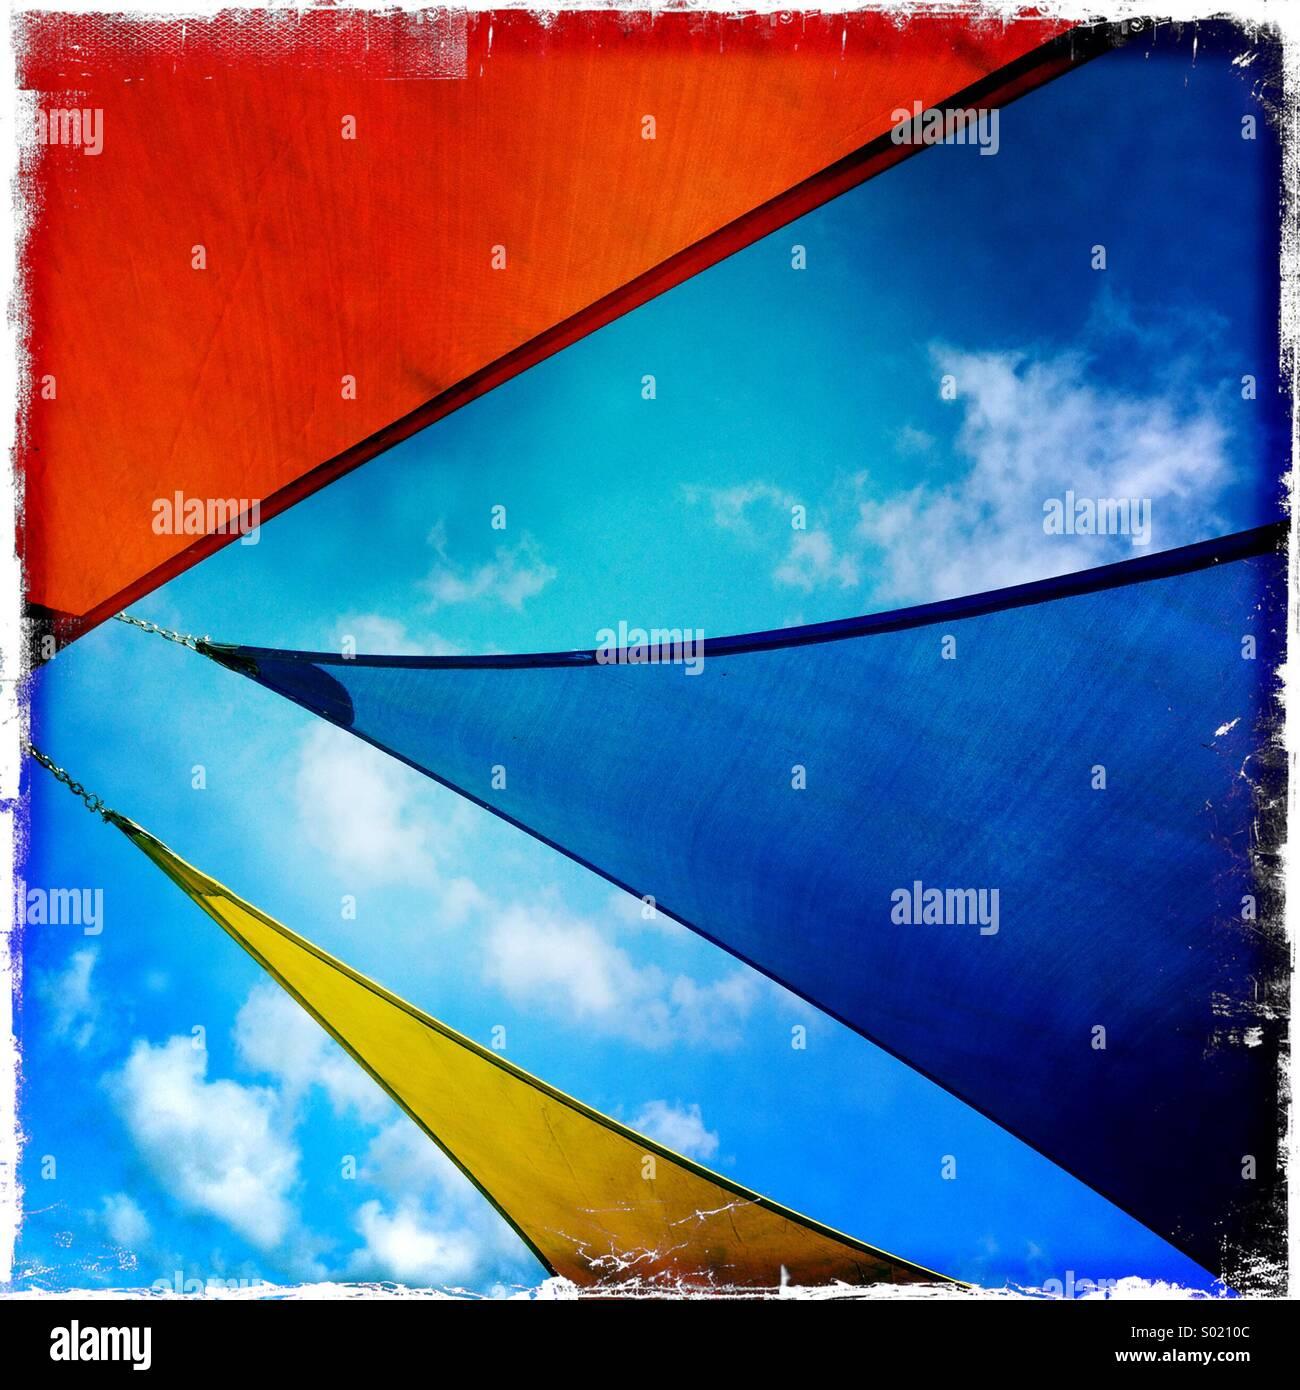 Sun sails - Stock Image